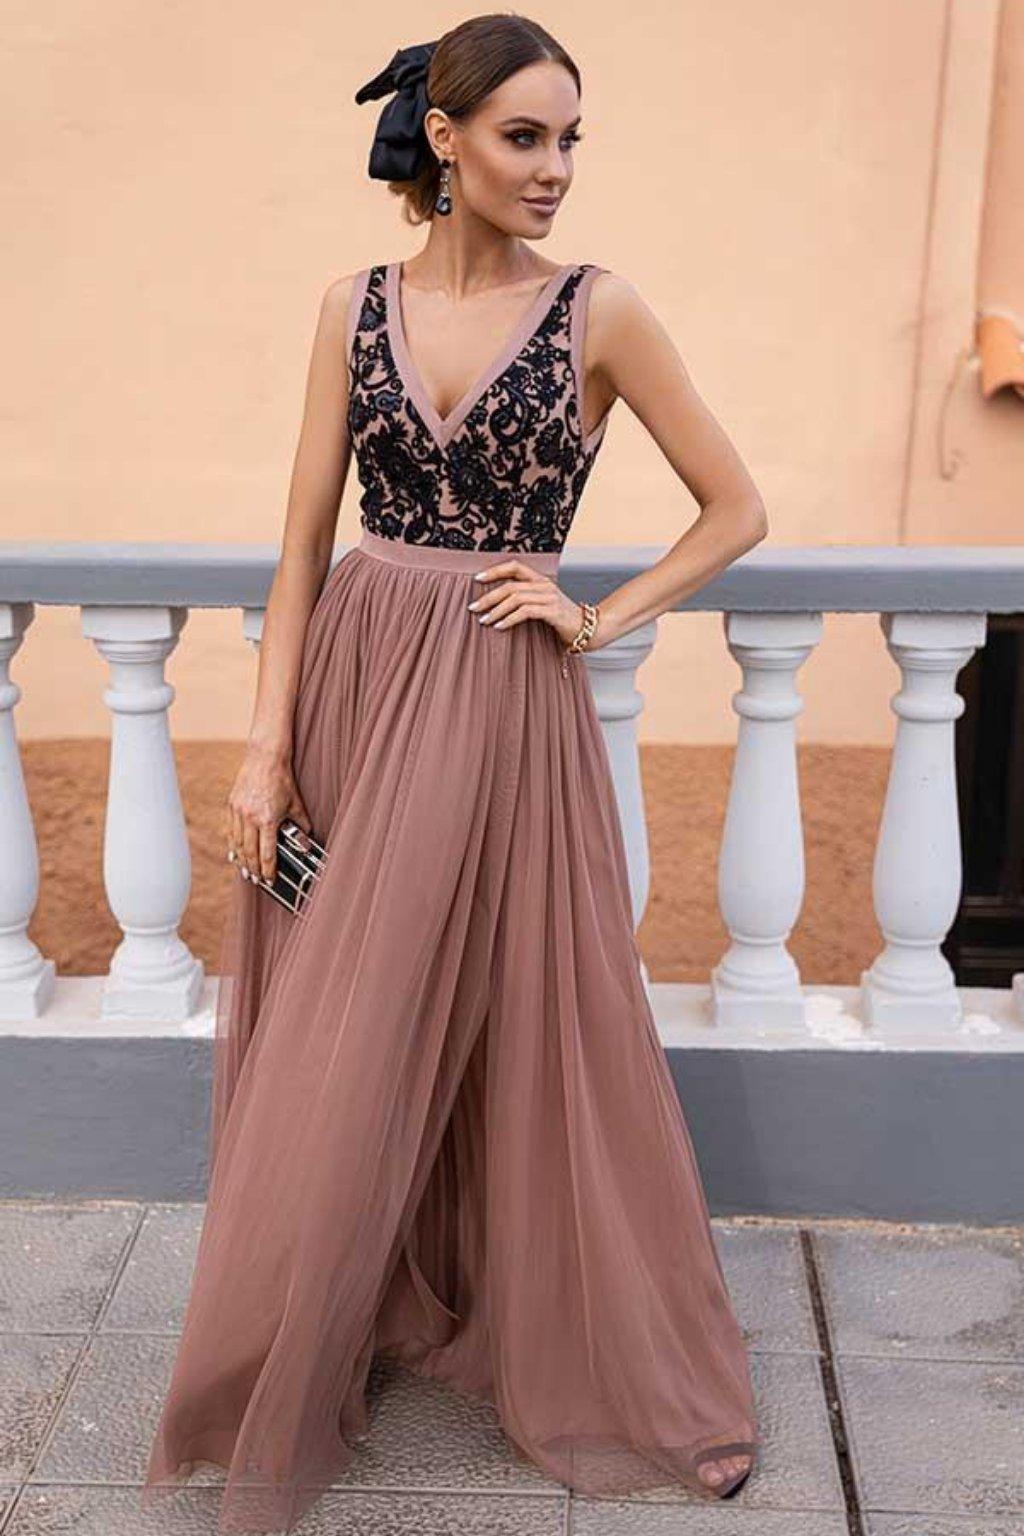 Hnedé spoločenské šaty s čiernou krajkou